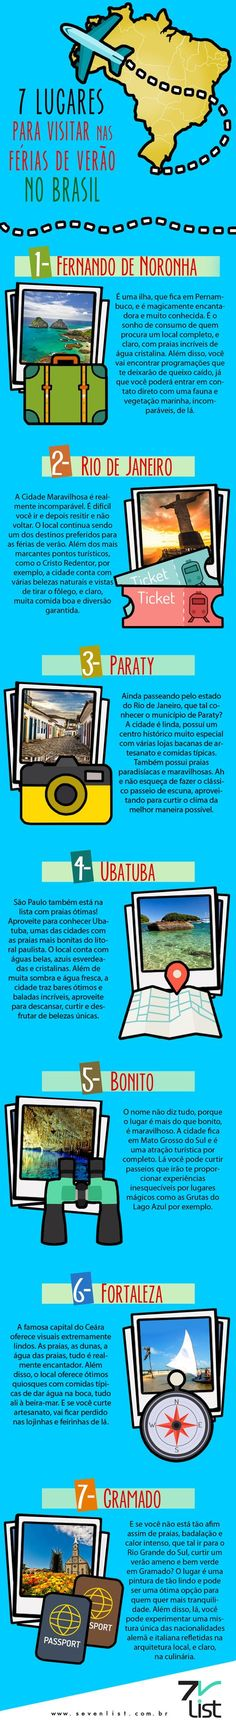 7 lugares para viajar no Brasil Mais